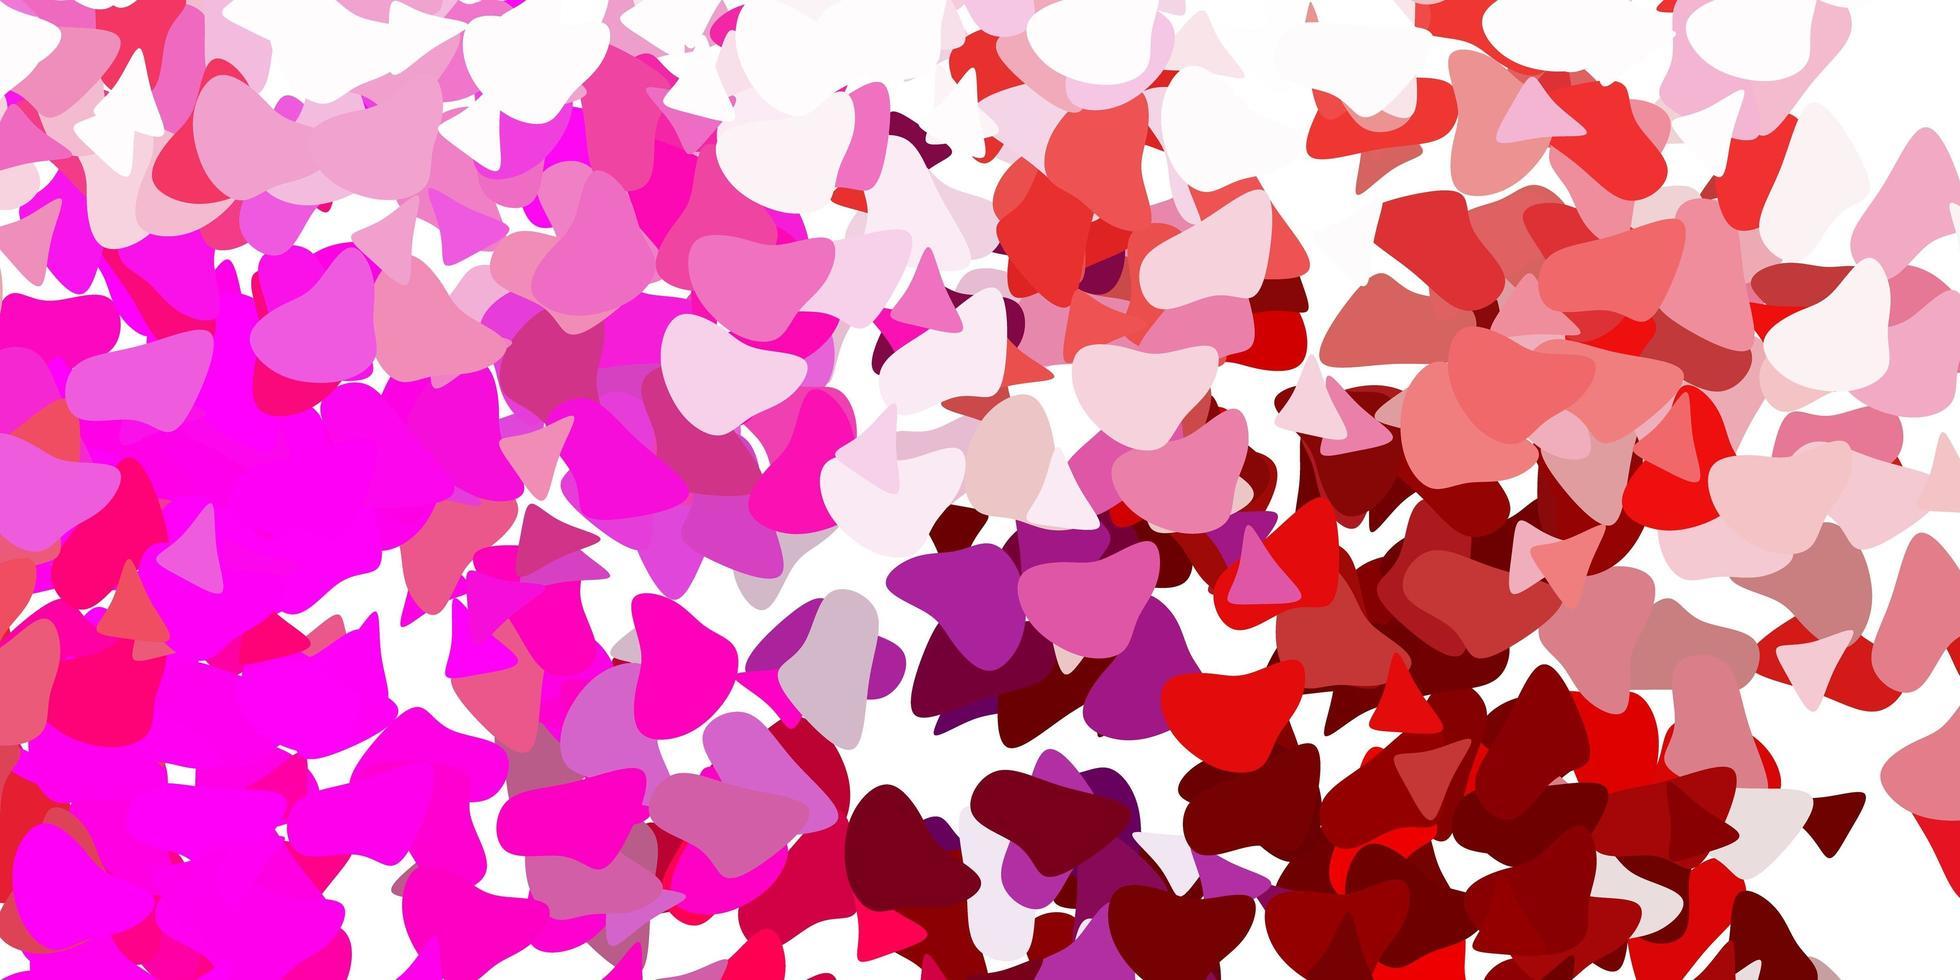 pano de fundo vector rosa claro roxo com formas caóticas.